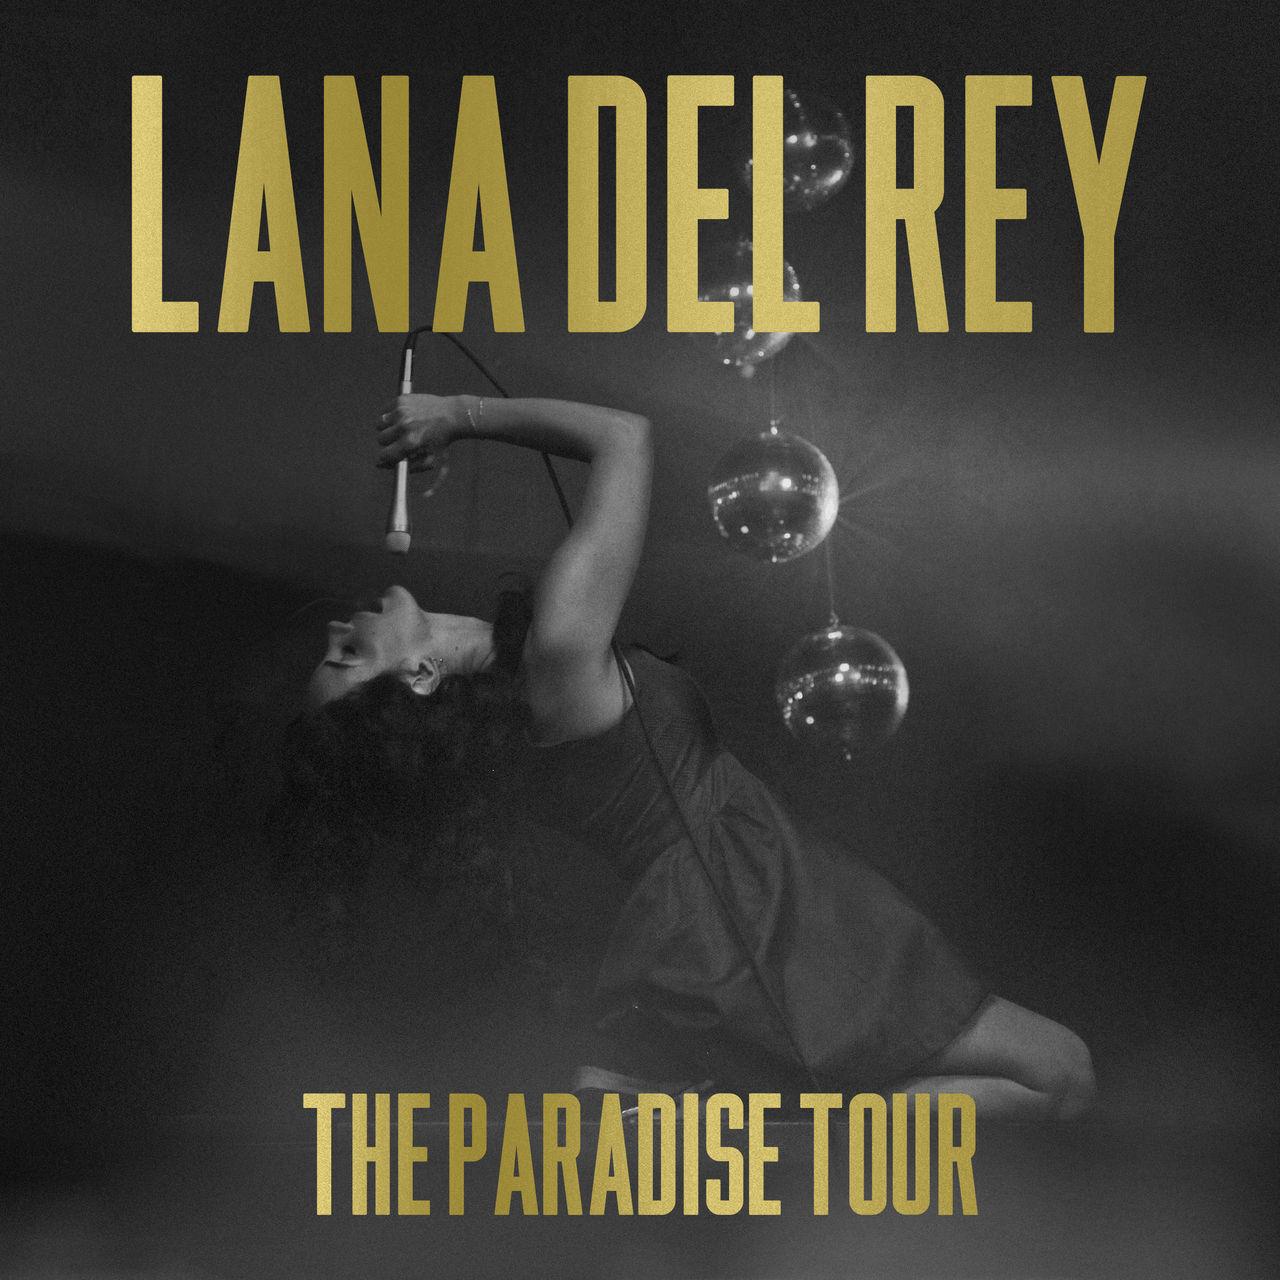 lana_del_rey_paradise_tour_by_kallumlavi